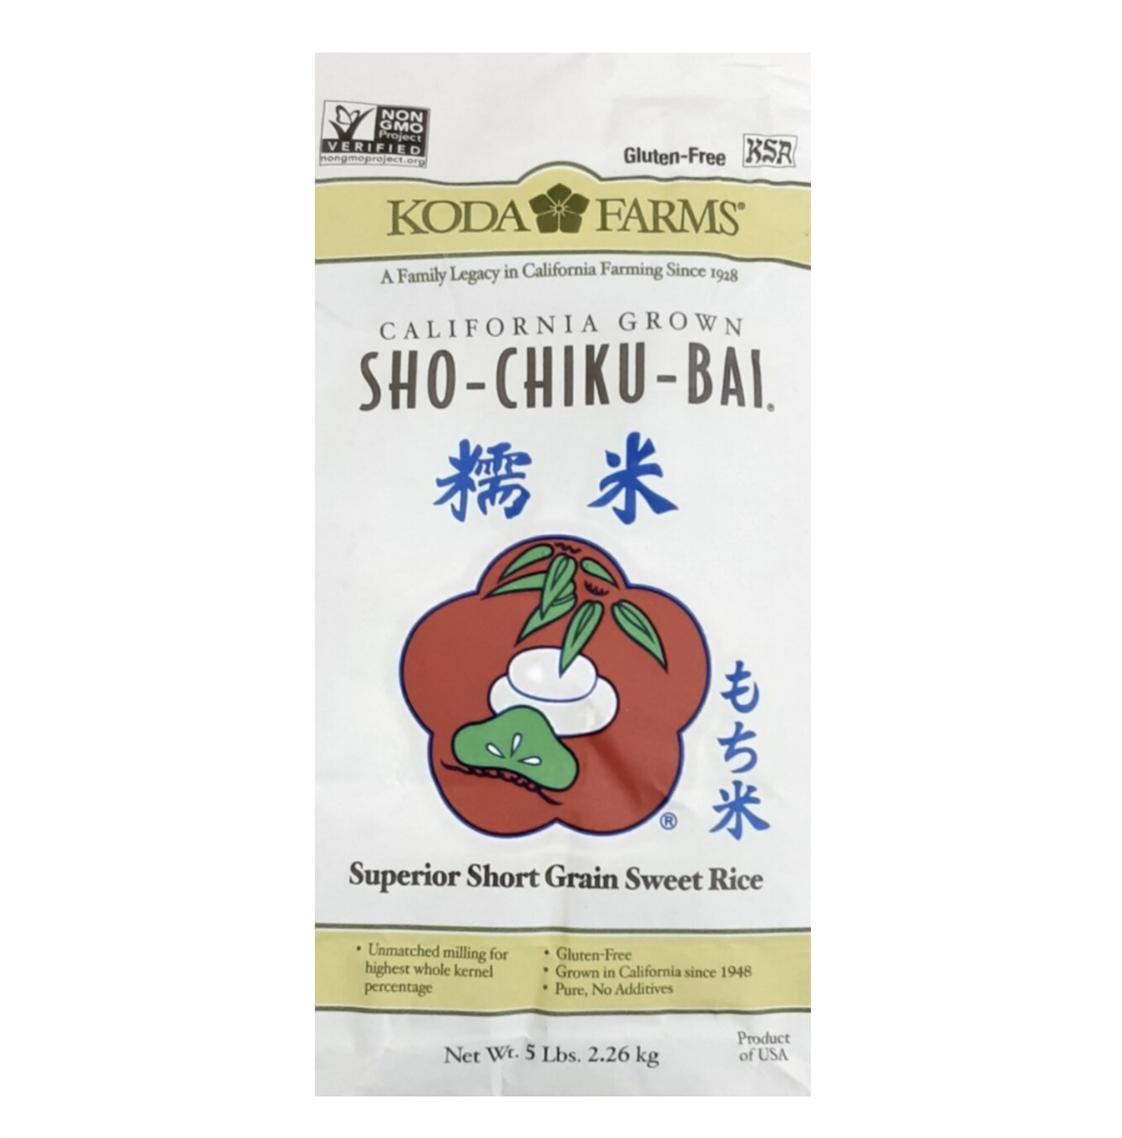 Koda Farms 糯米 ~2.26kg(5lbs) KODA FARMS Superior Short Grain Sweet Rice 2.26kg(5lbs)